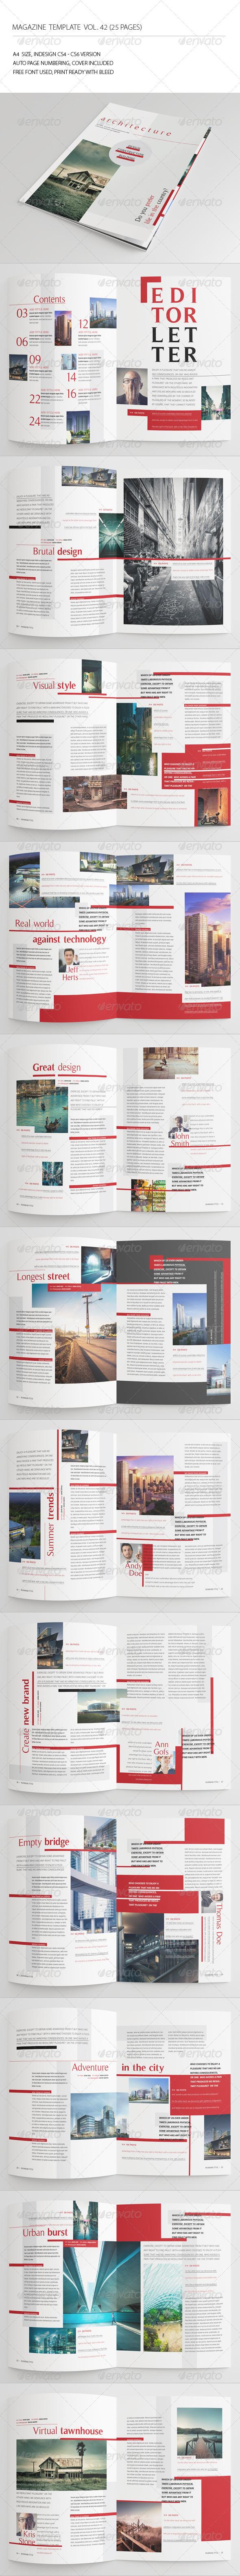 25 Pages Architecture Magazine Vol42